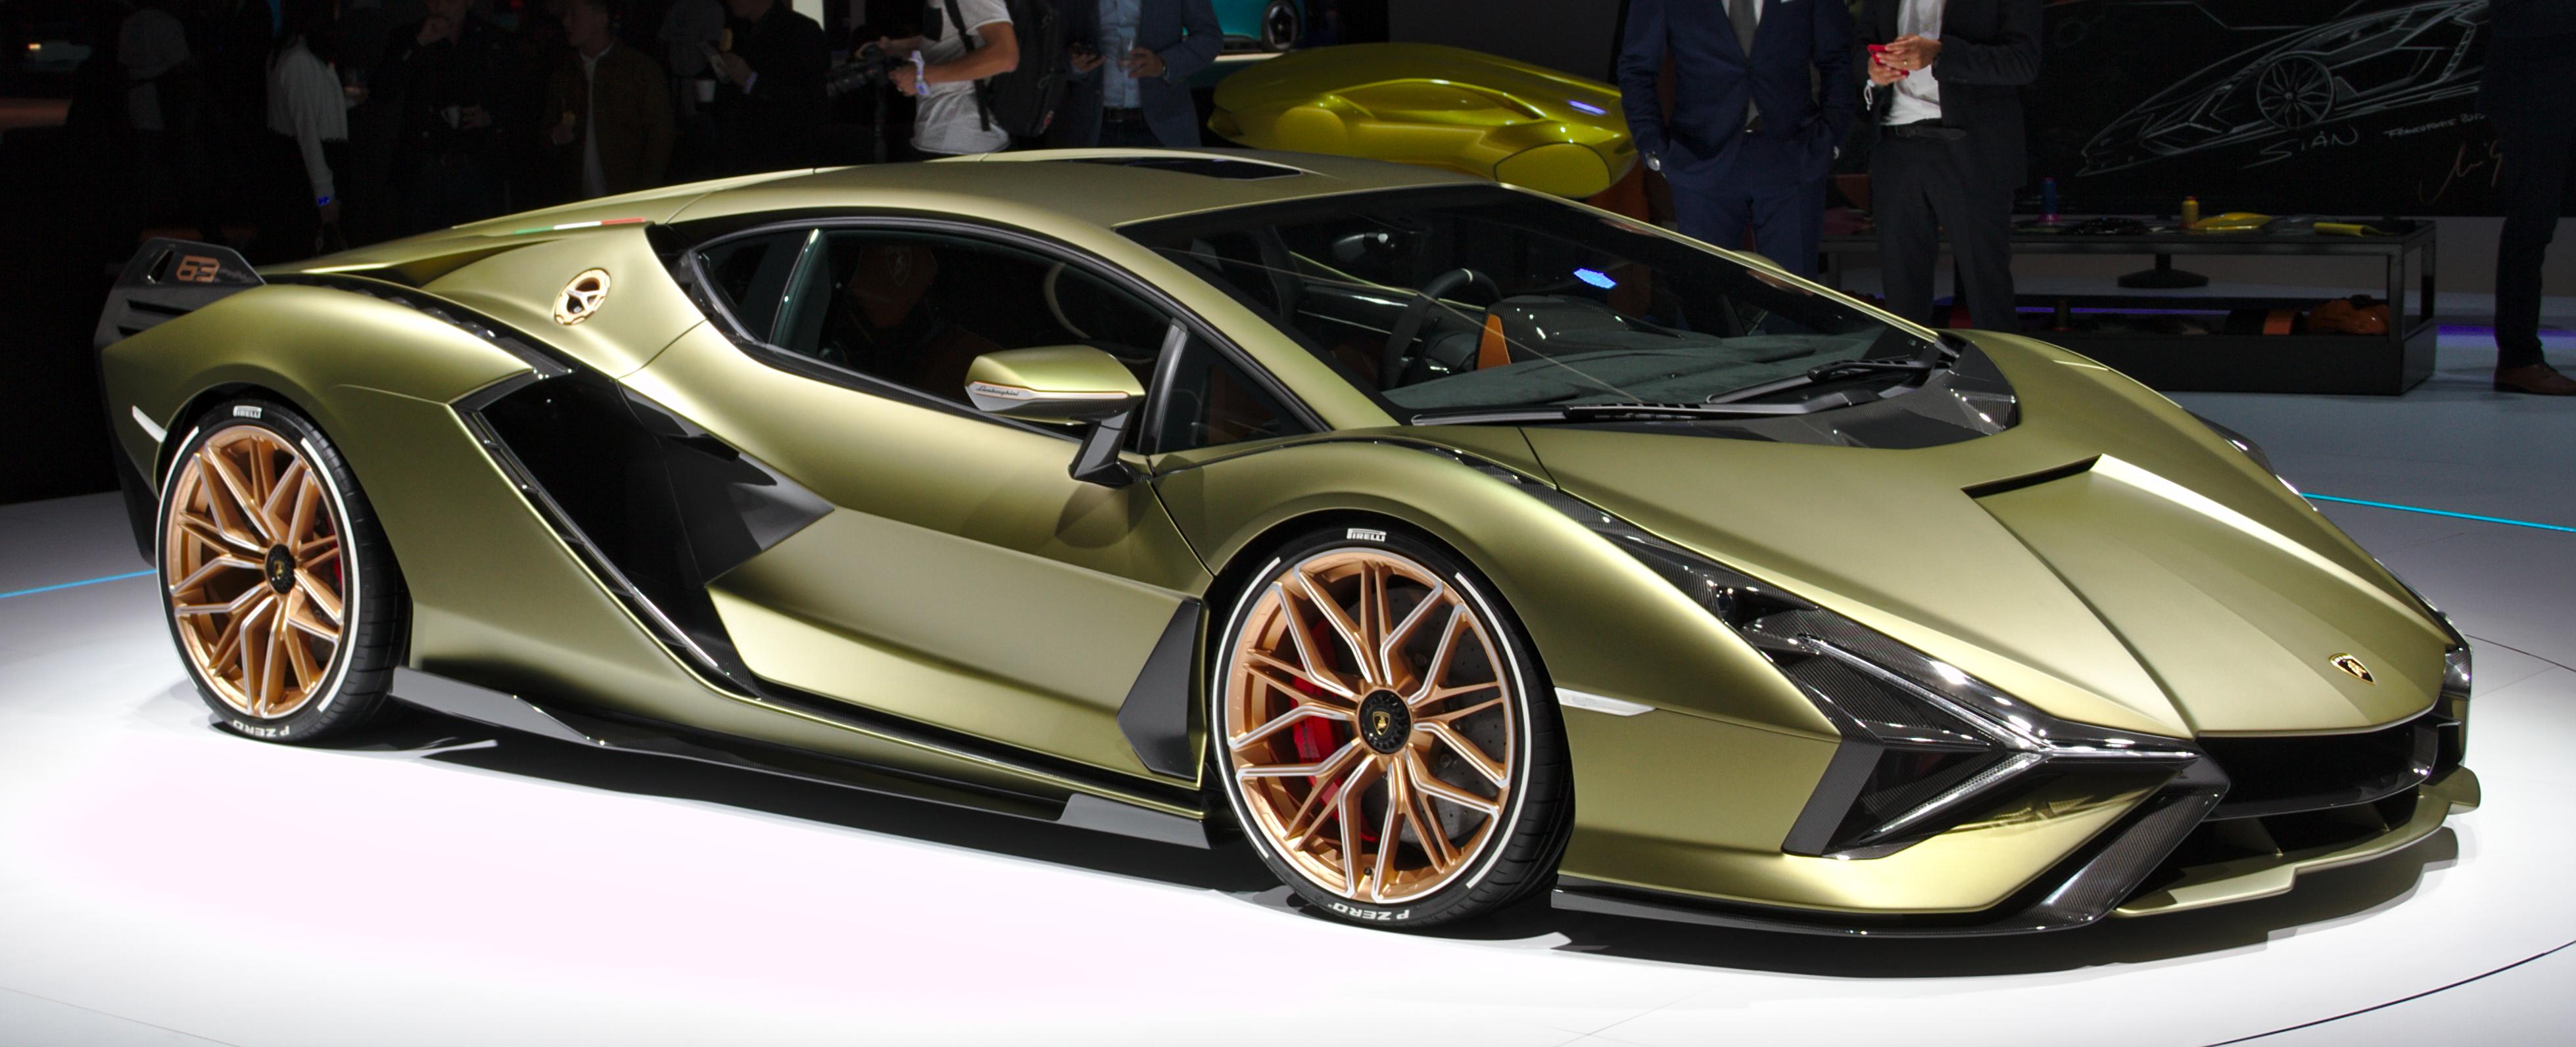 Lamborghini Sián FKP 37 – Wikipedia